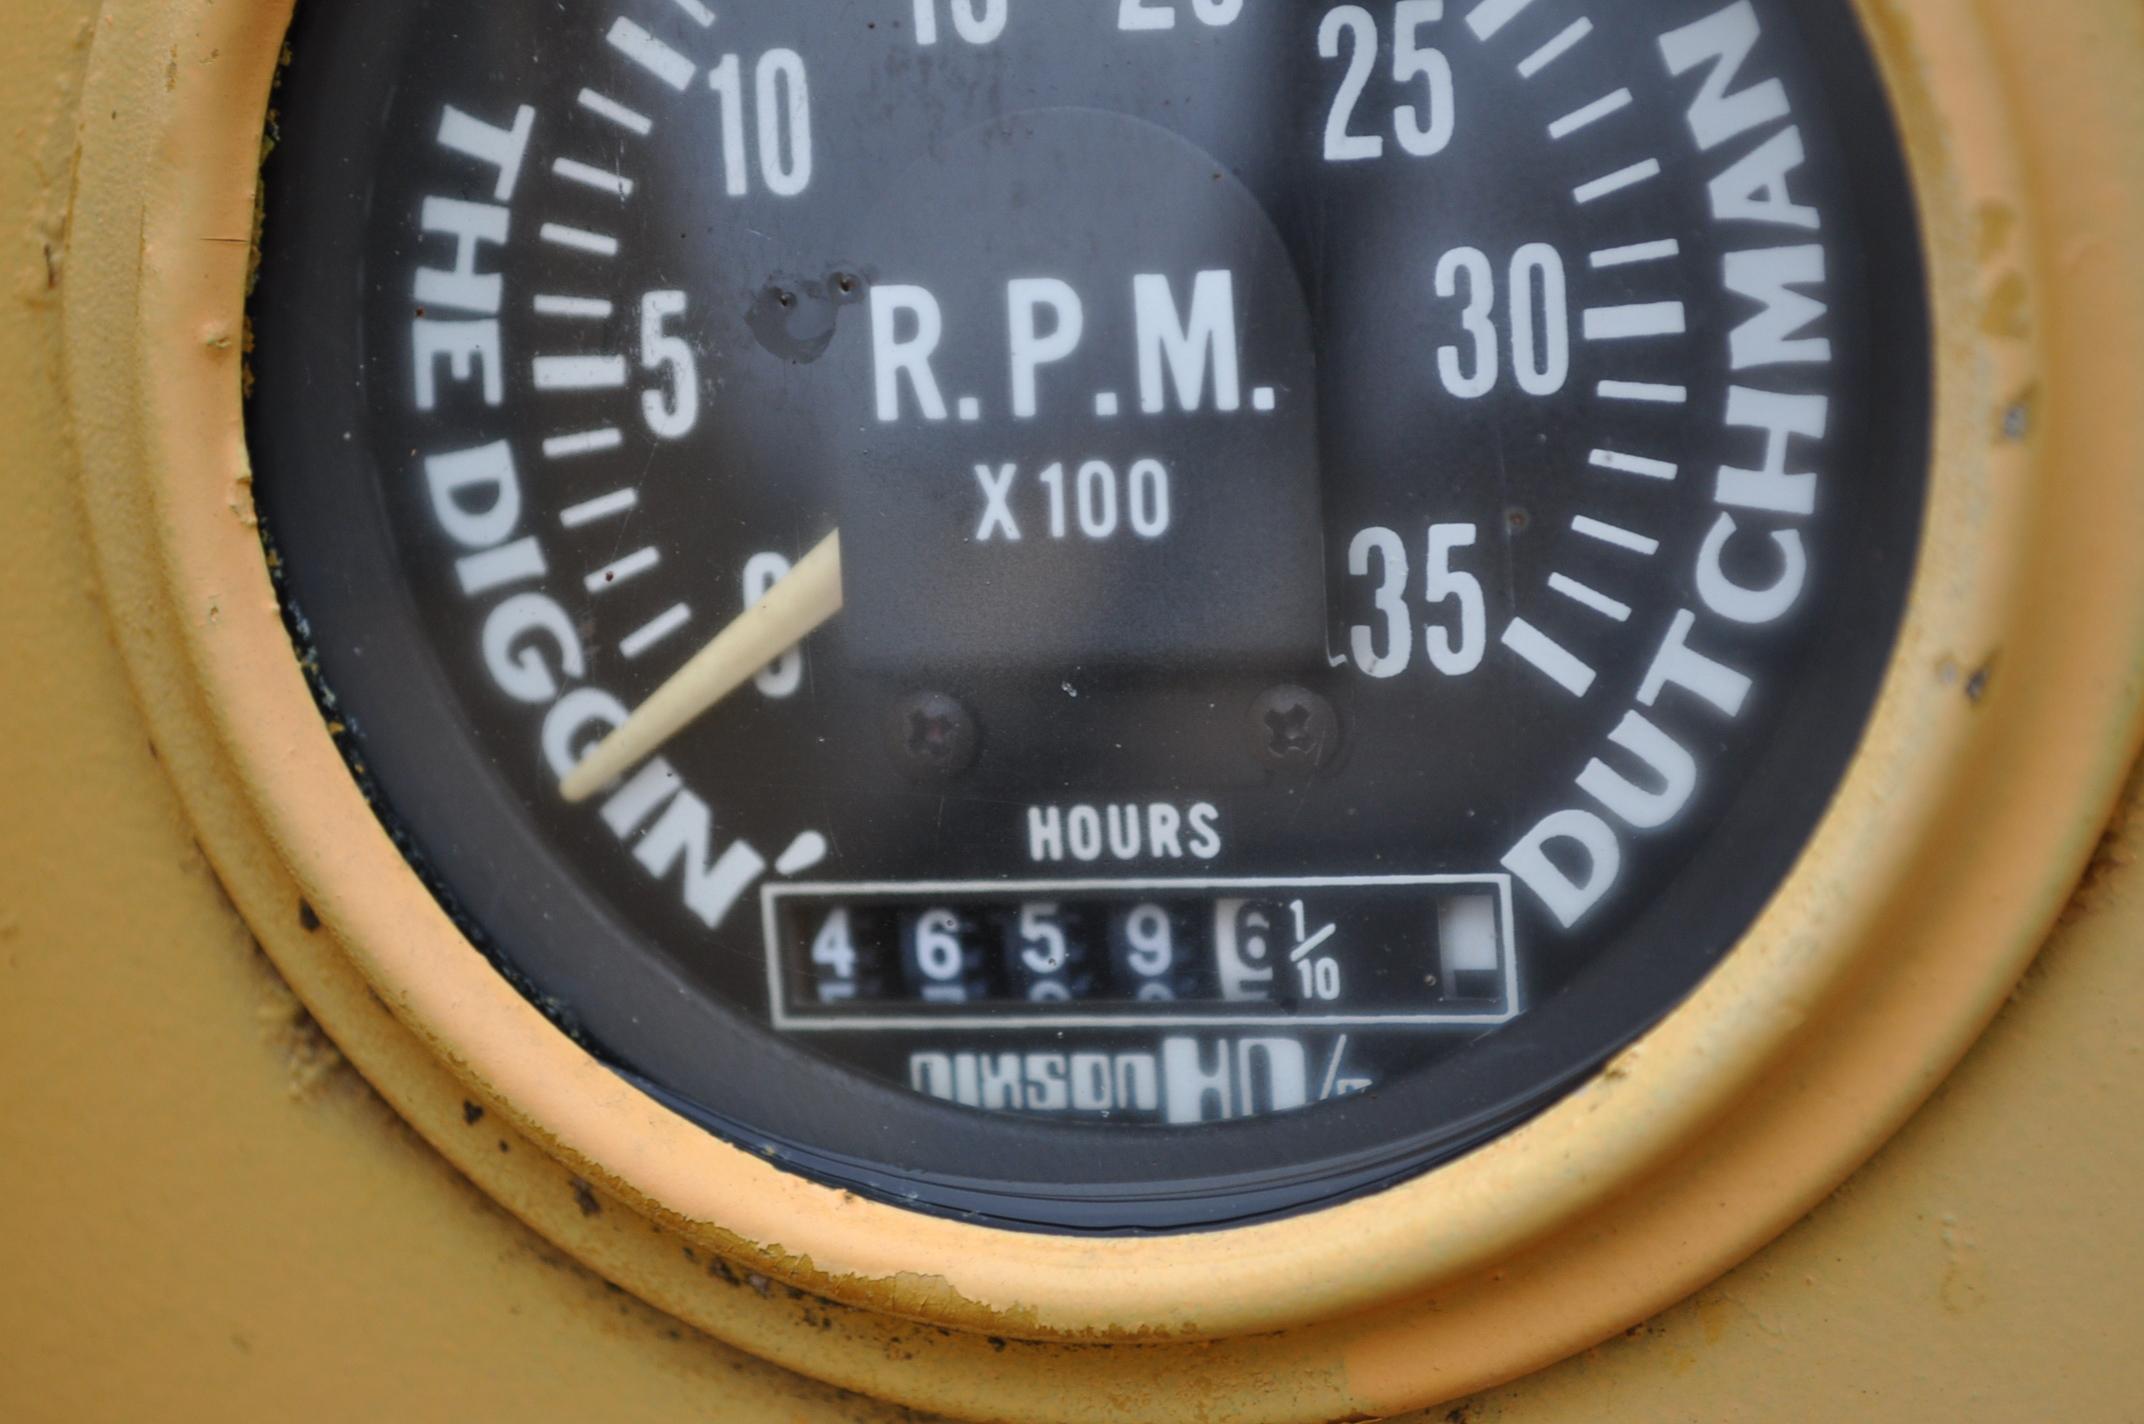 Vermeer V450 Trencher, parts machine, backhoe attachment, JD diesel, SN 1VRF082L2H1000460 - Image 10 of 15